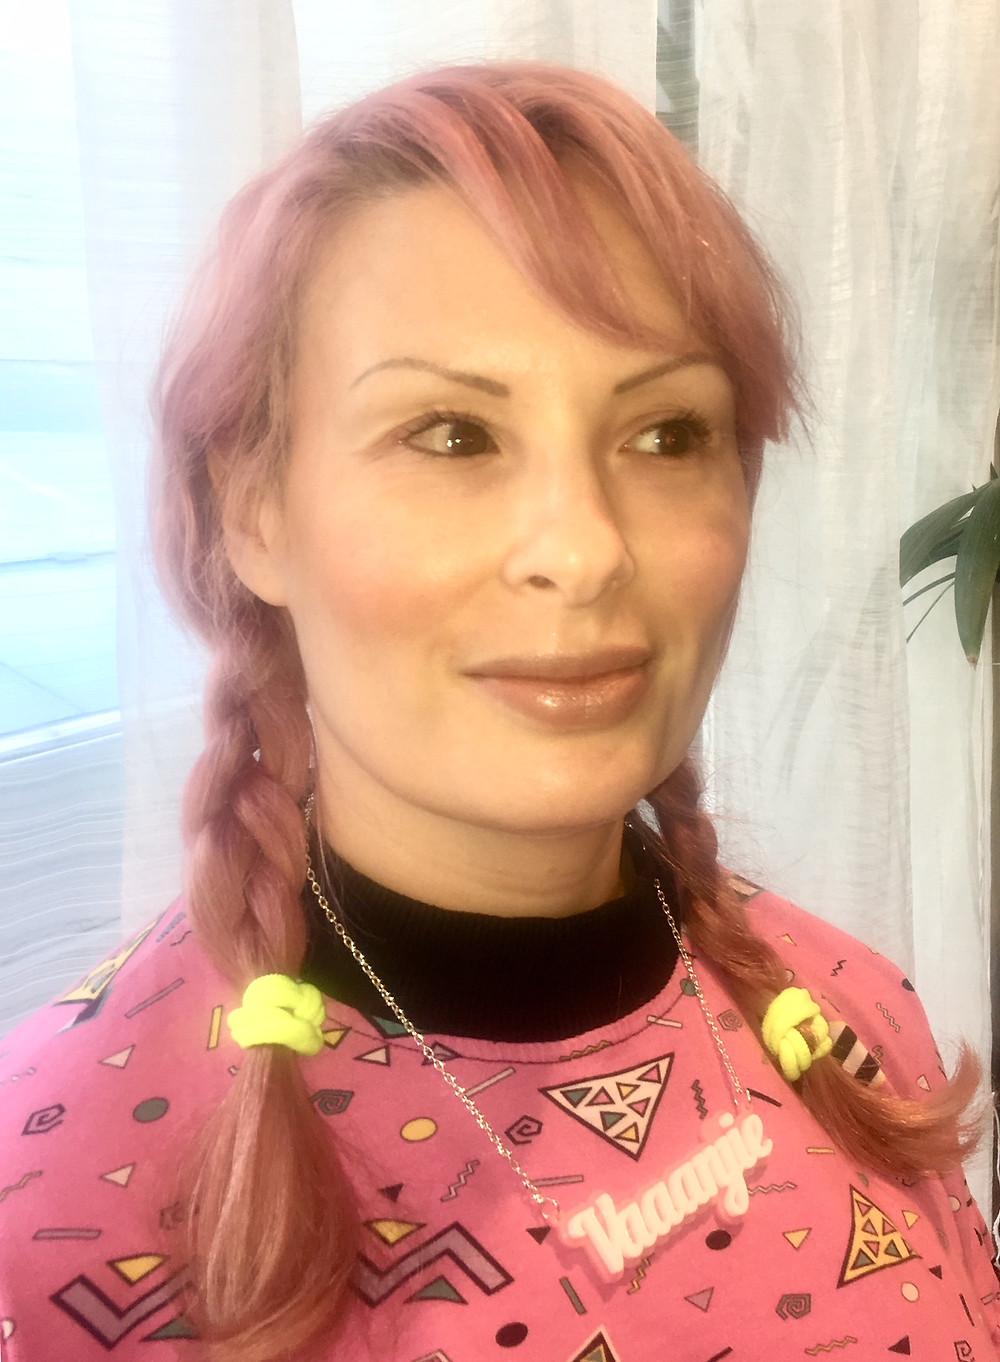 Nikki after makeover by Emma using V Lace Maya Palette